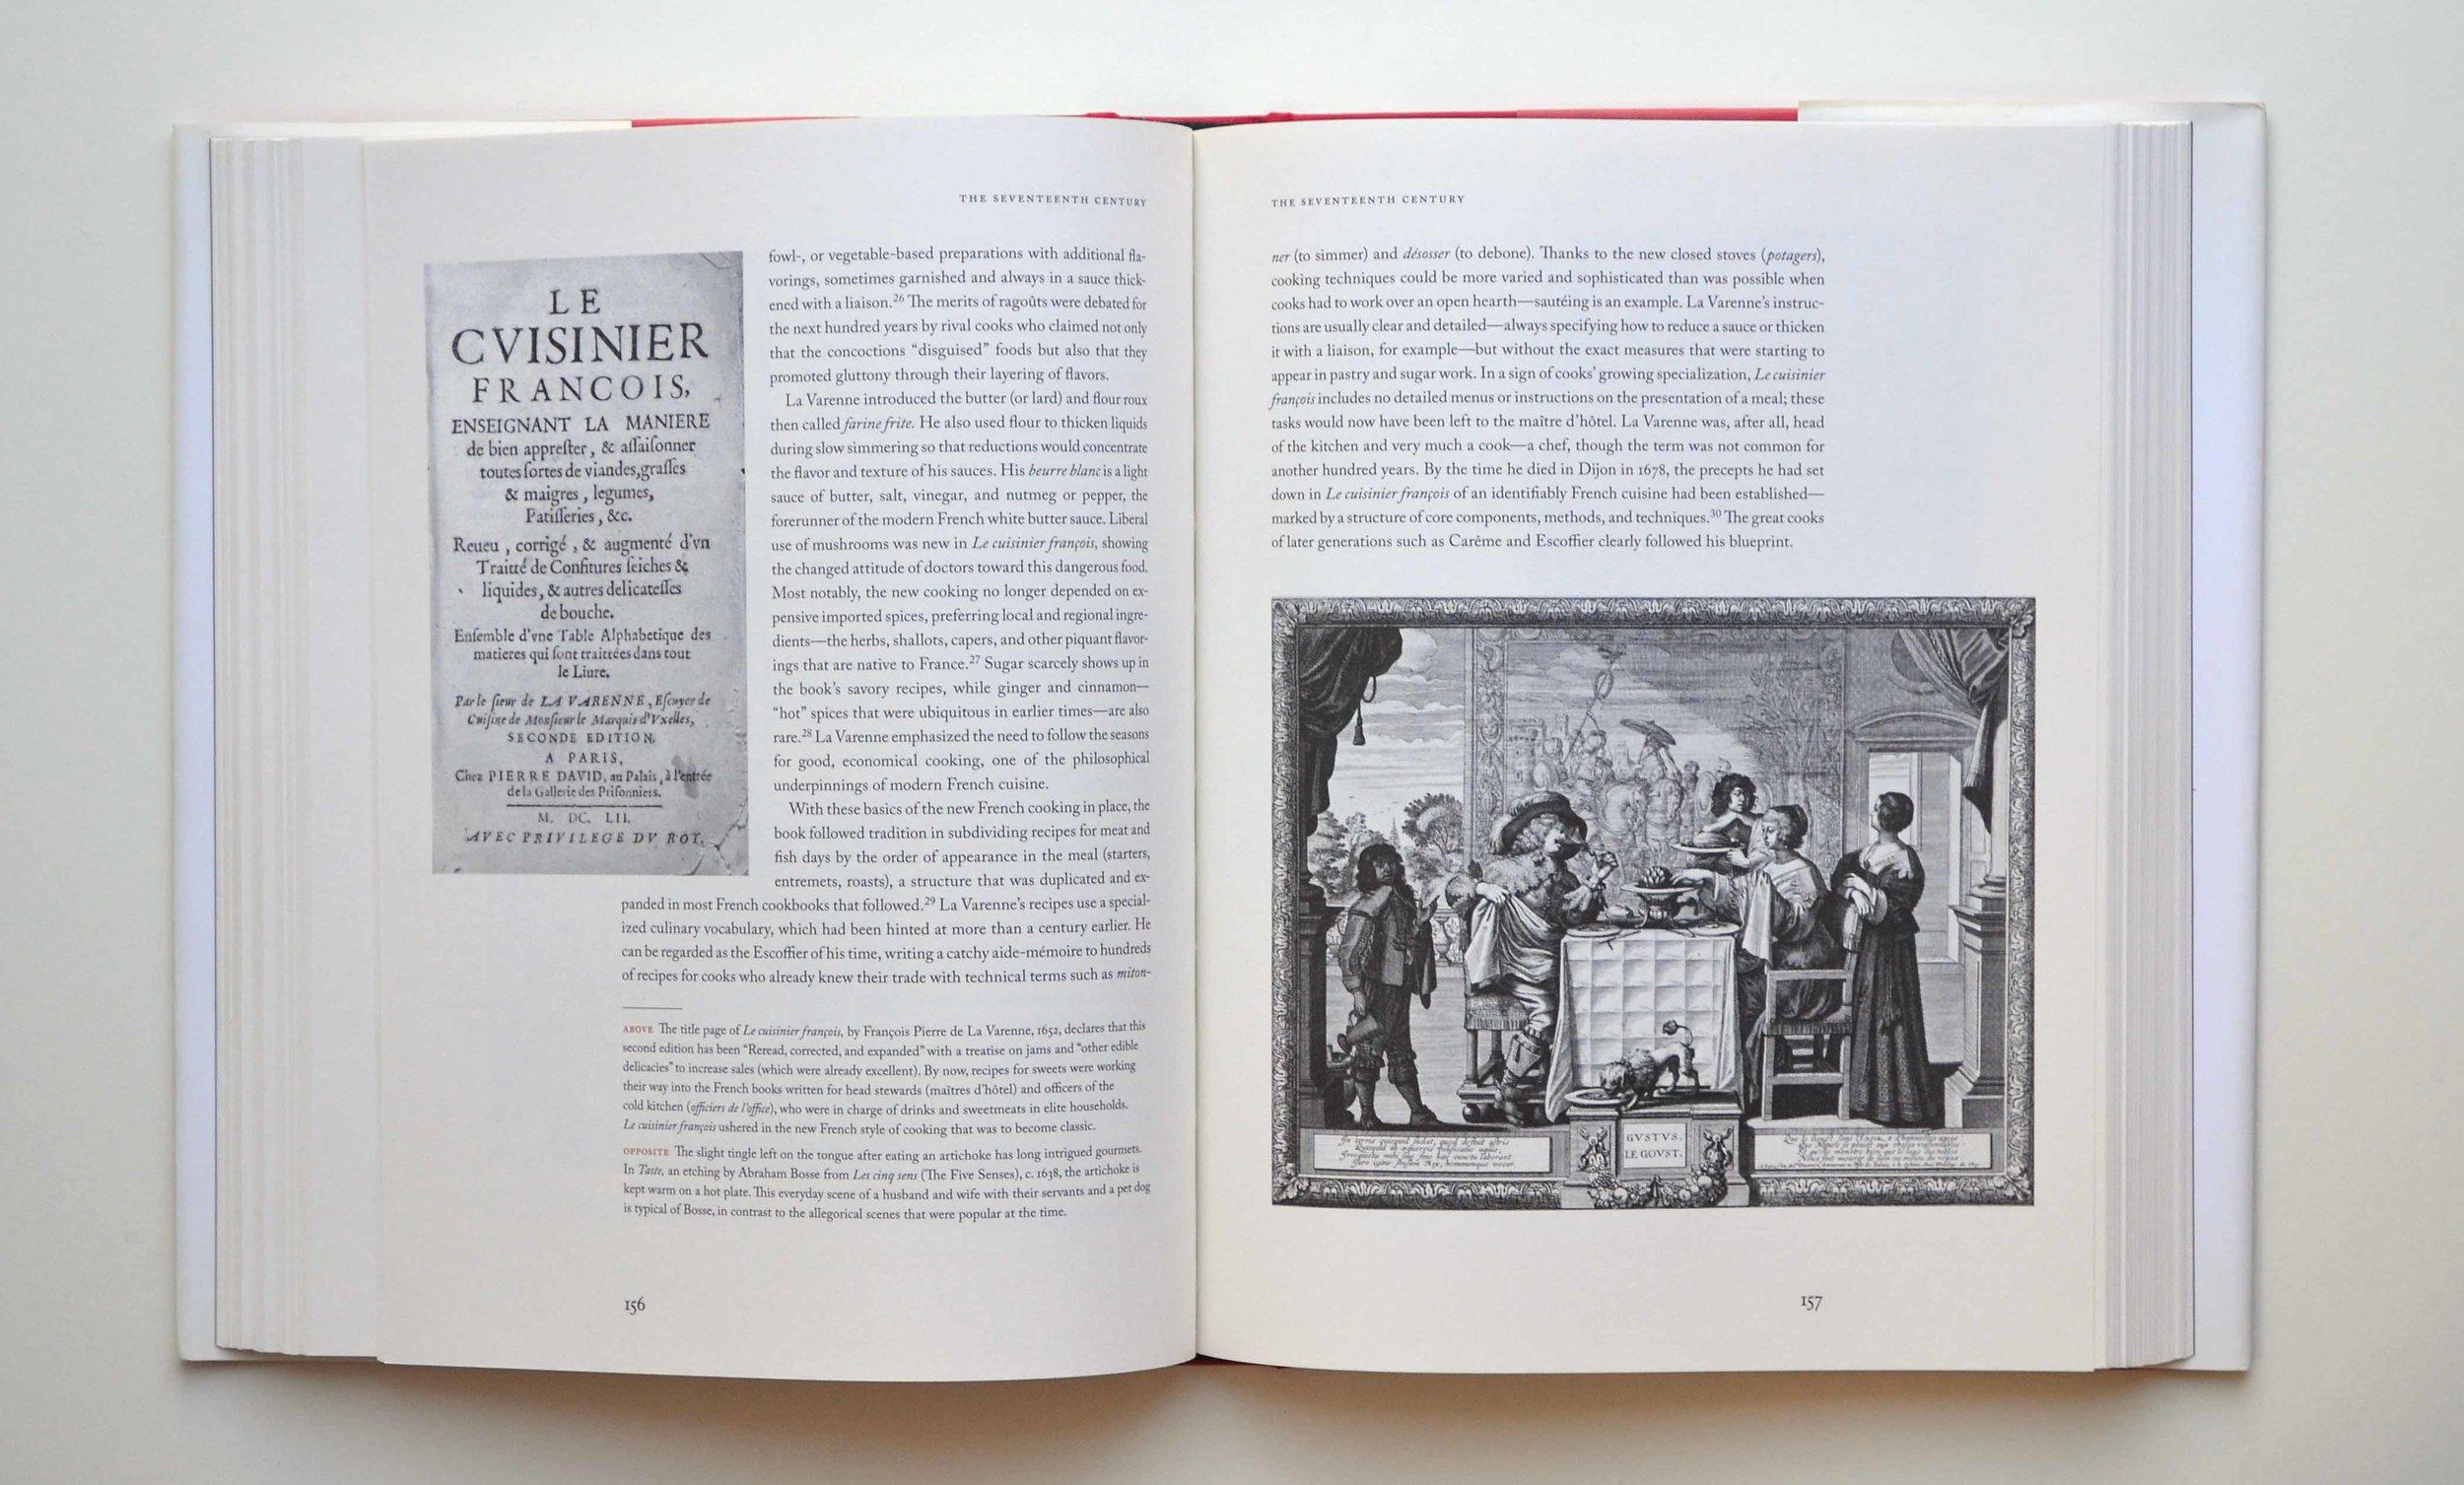 cookbook-library-7tx.jpg